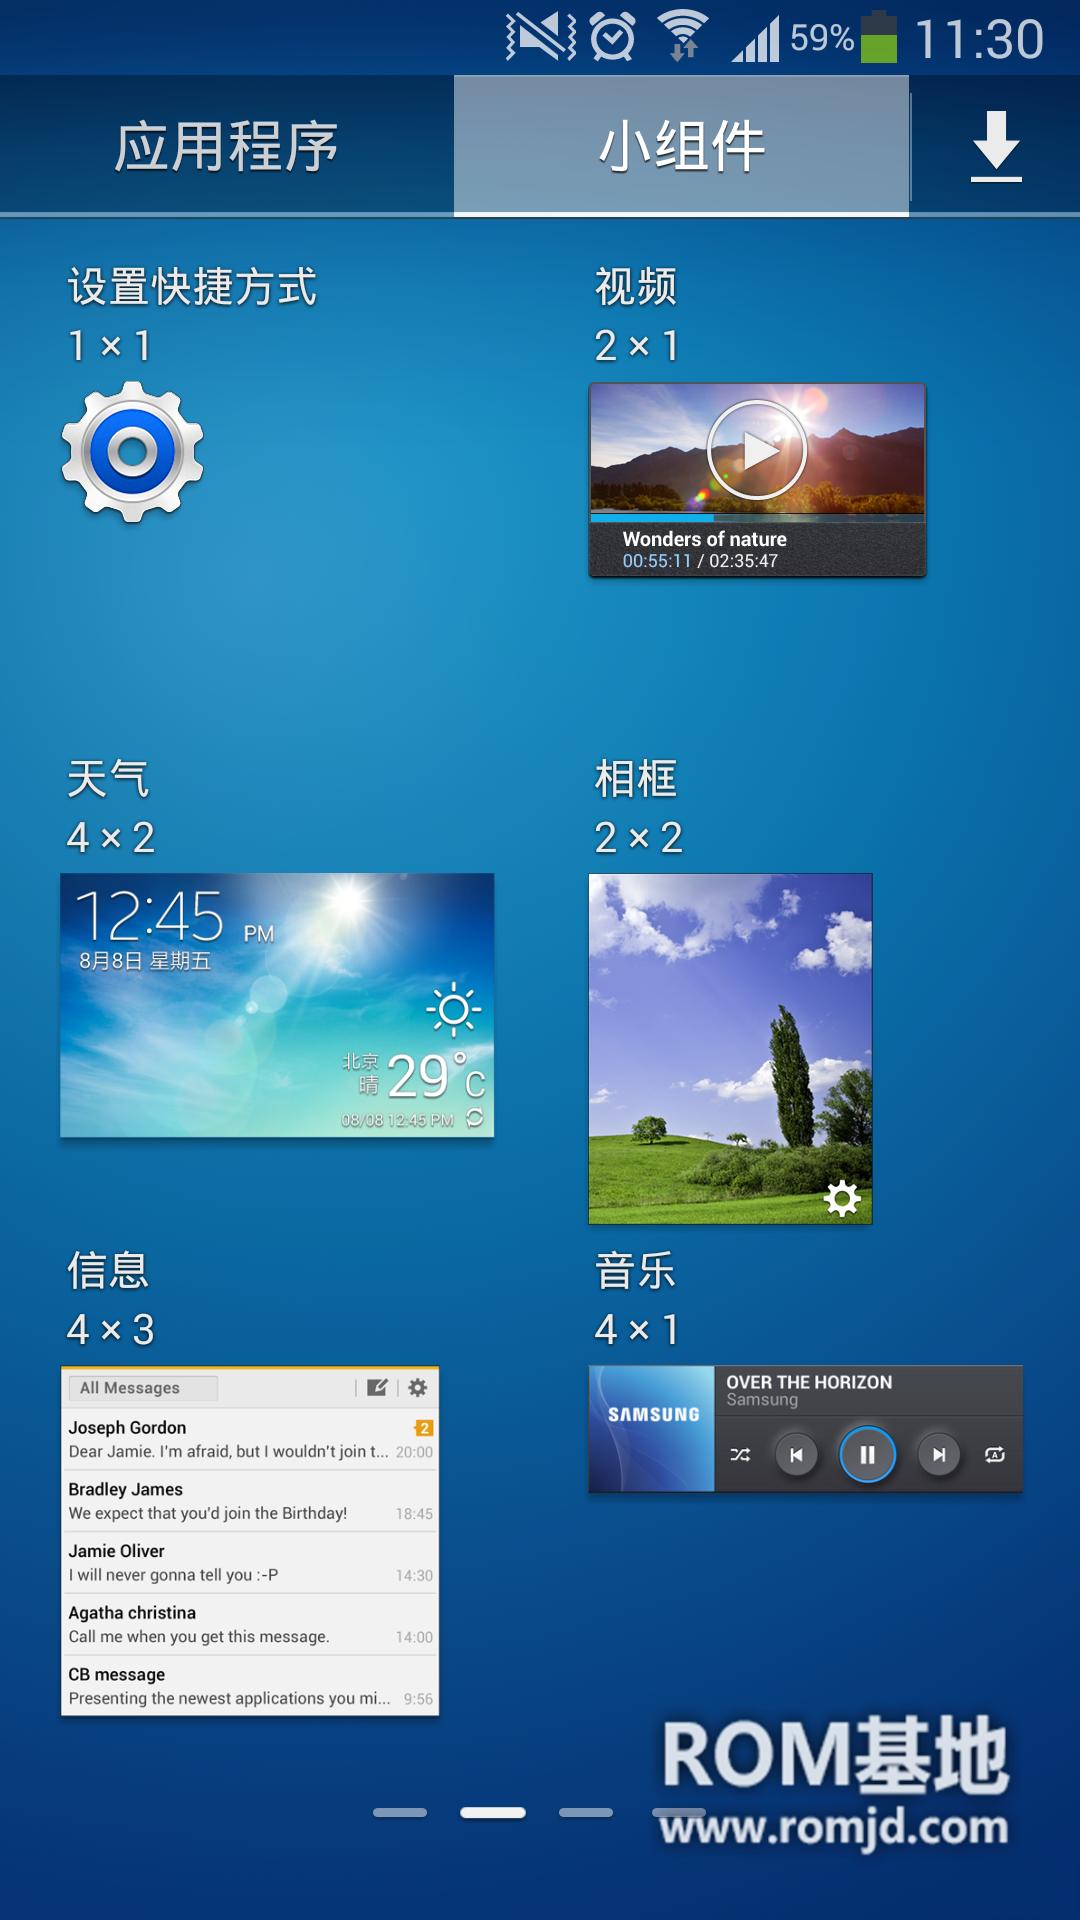 三星 N9006(Note3)线刷包  Android4.4 官方ZCUENC2固件五件套ROM刷机包截图